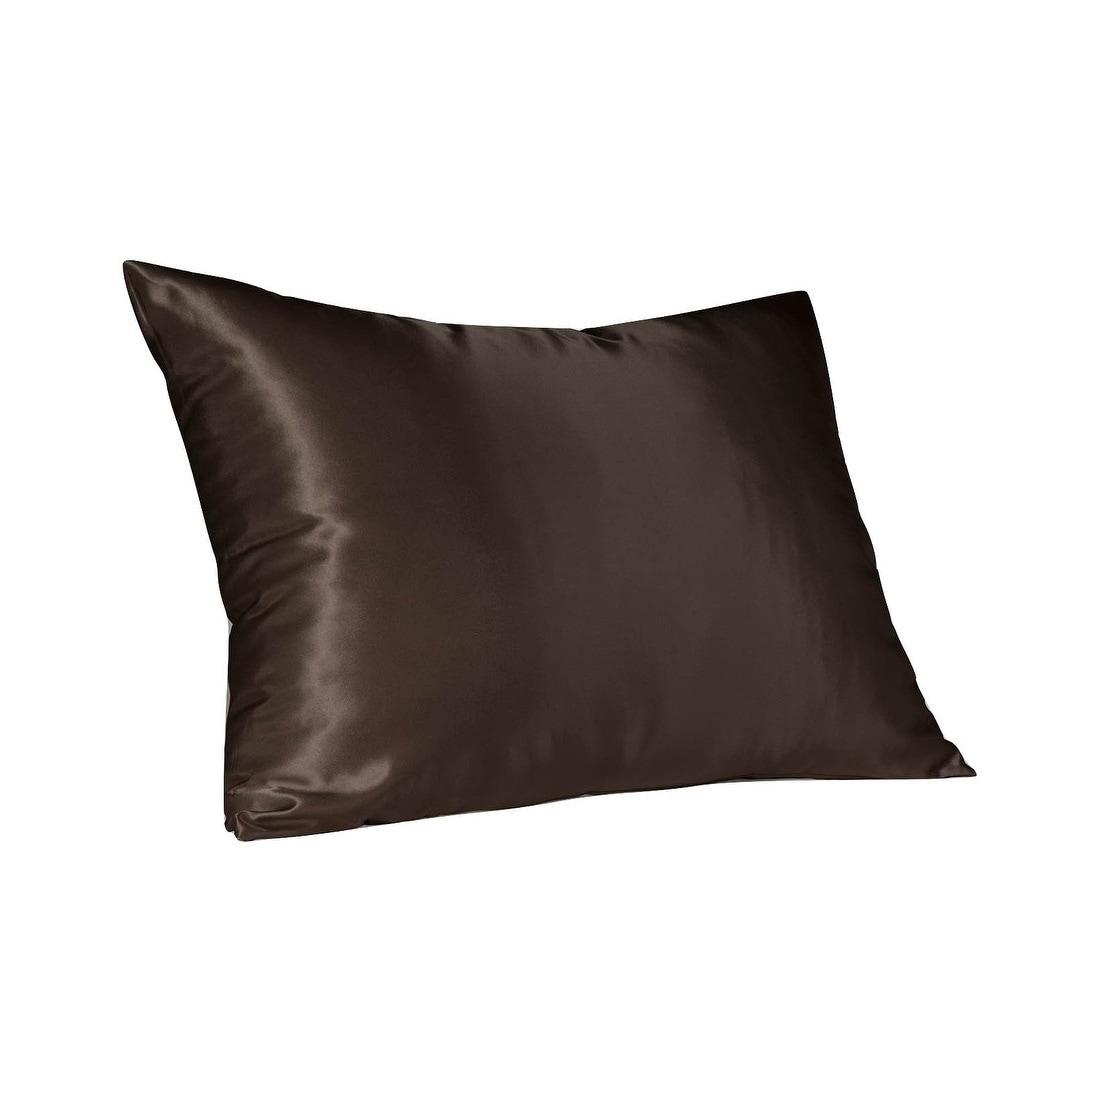 Jaguar Sweet Dreams Silky Satin Pillow Case With Hidden Z...